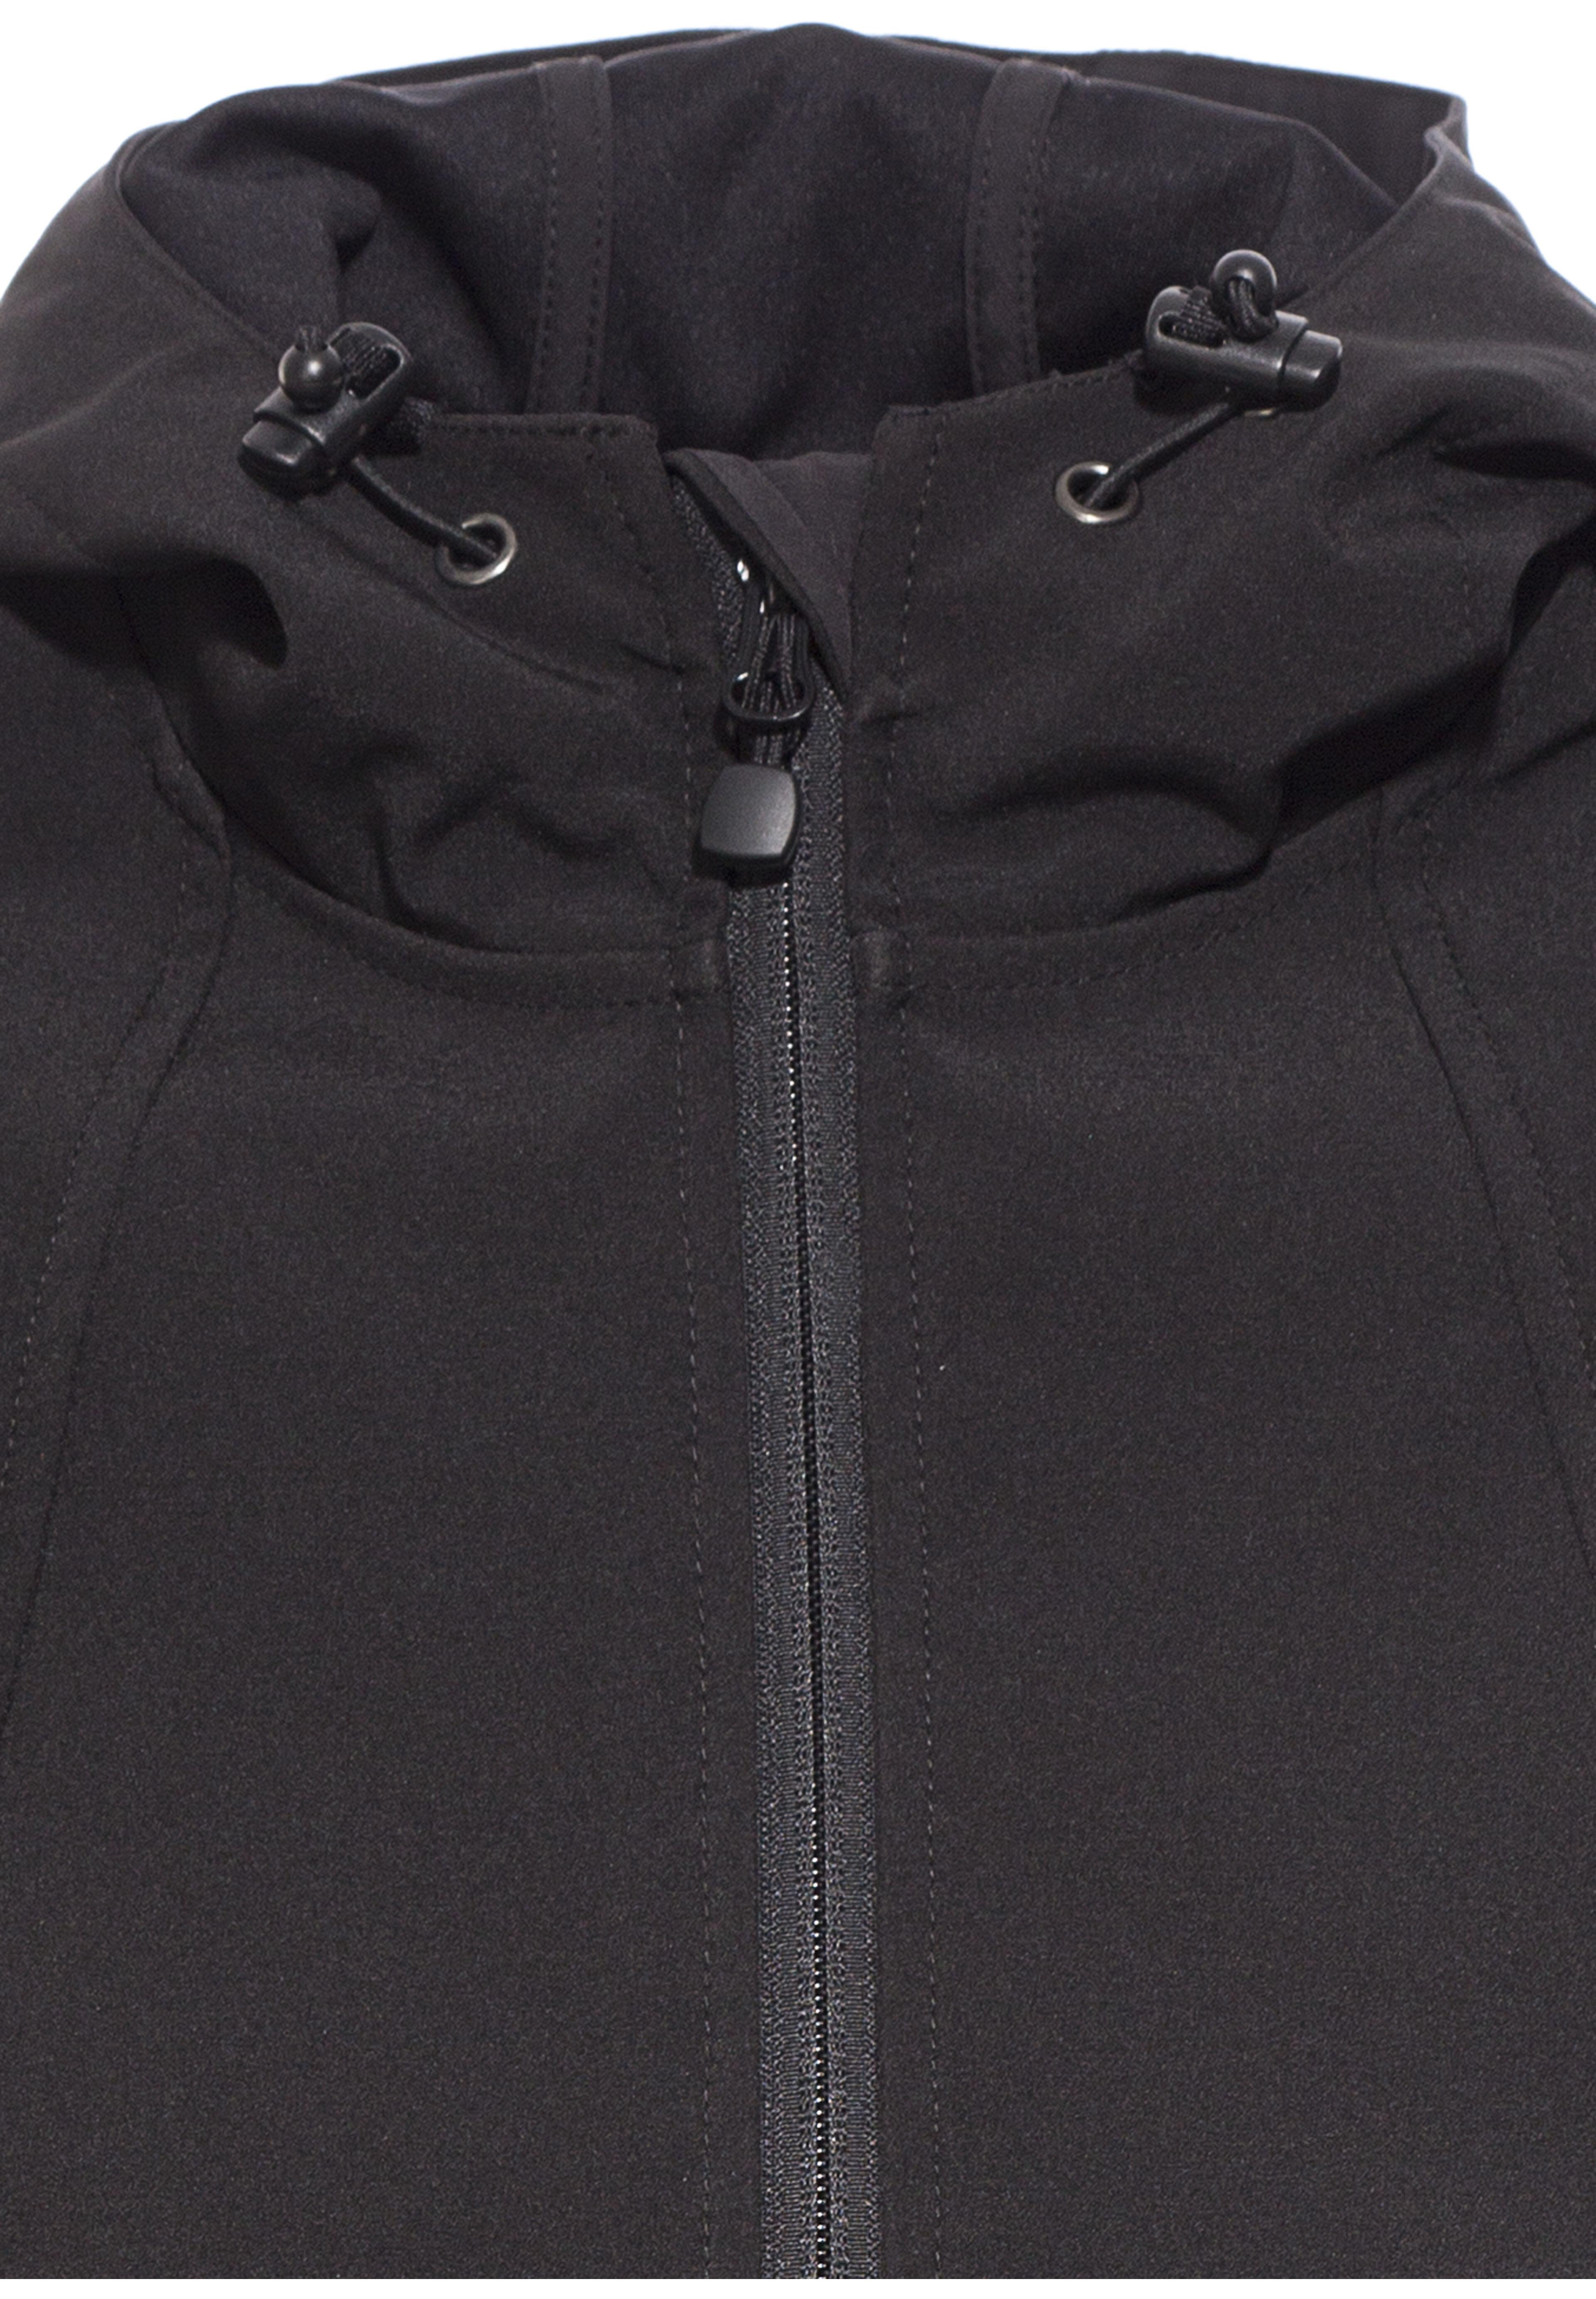 axant Alps softshell jas Dames zwart l Outdoor winkel campz.be 90cab0dd29